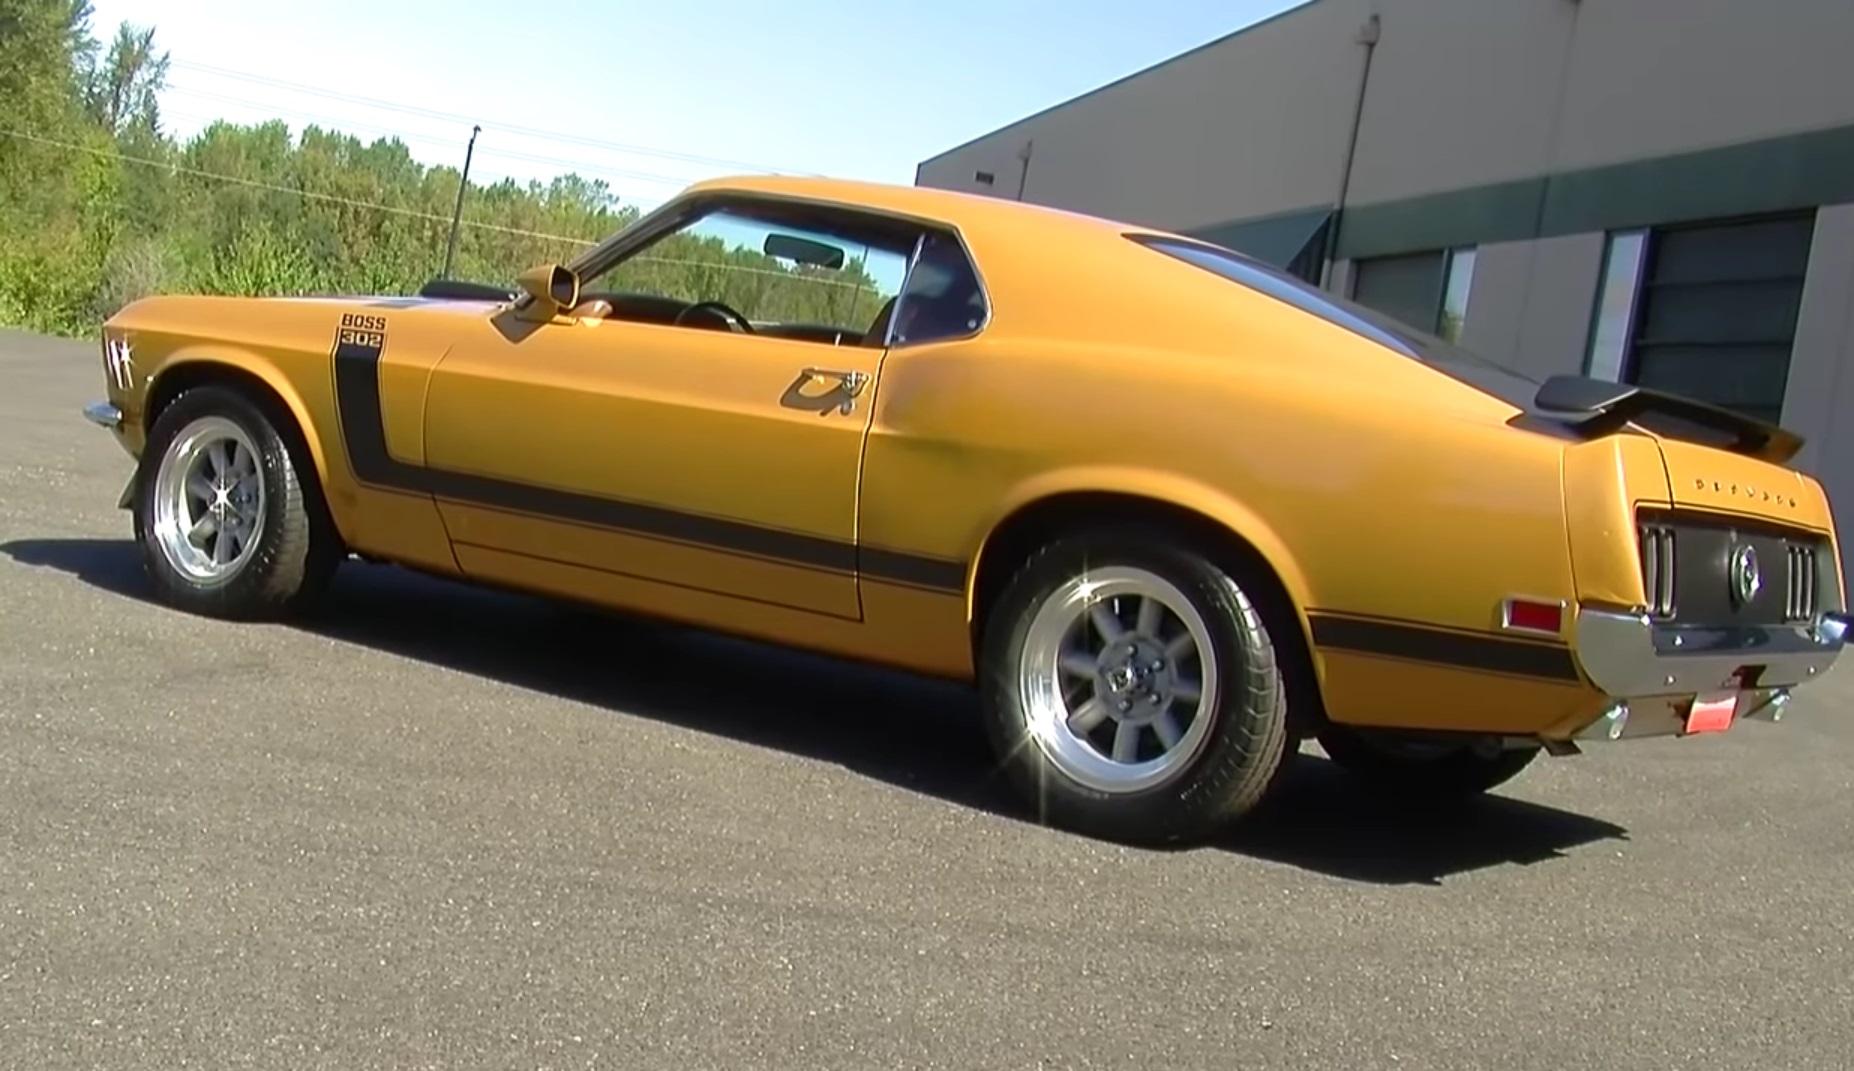 Video: Closer Look At A Metallic Gold 1970 Ford Mustang Boss 302